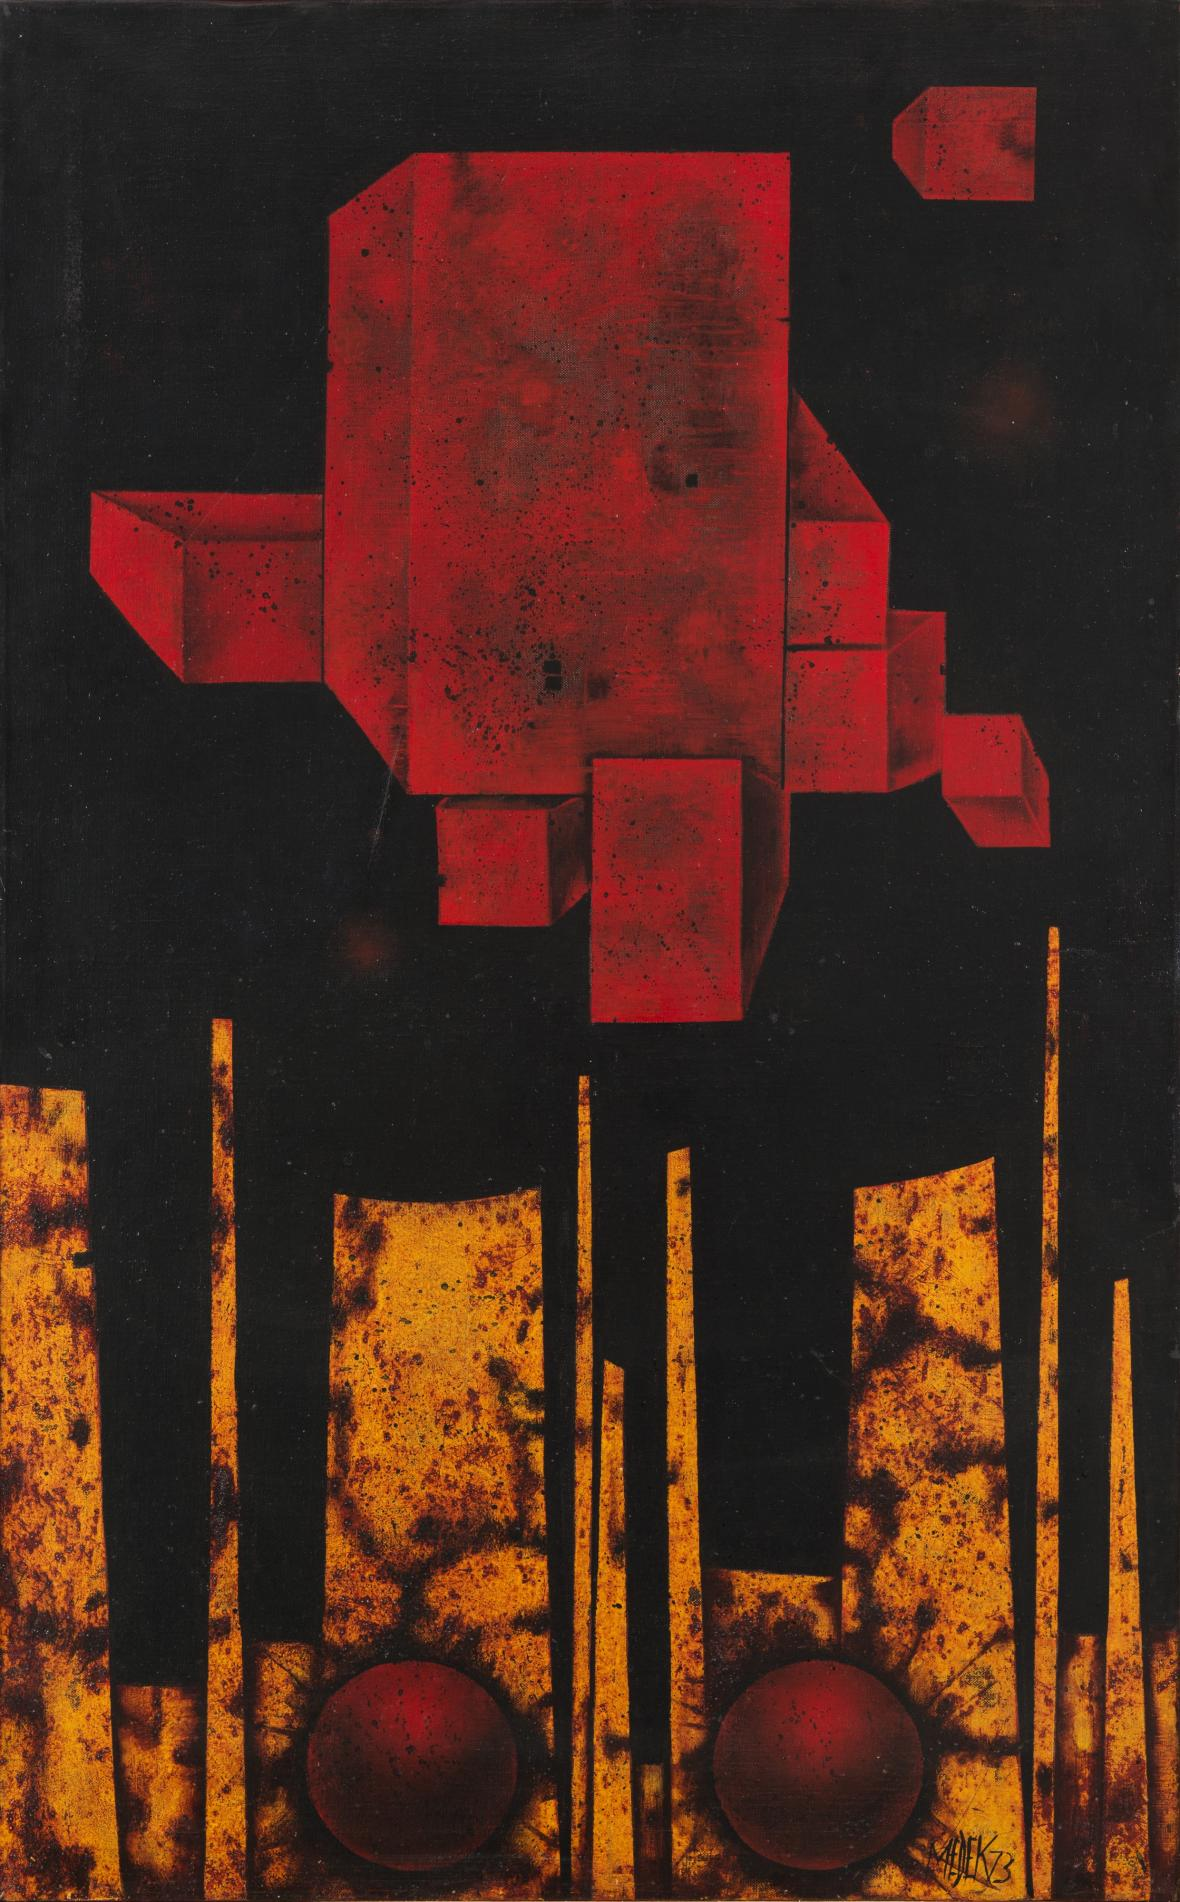 Mikuláš Medek / Pohyblivý hrob IV (1973)